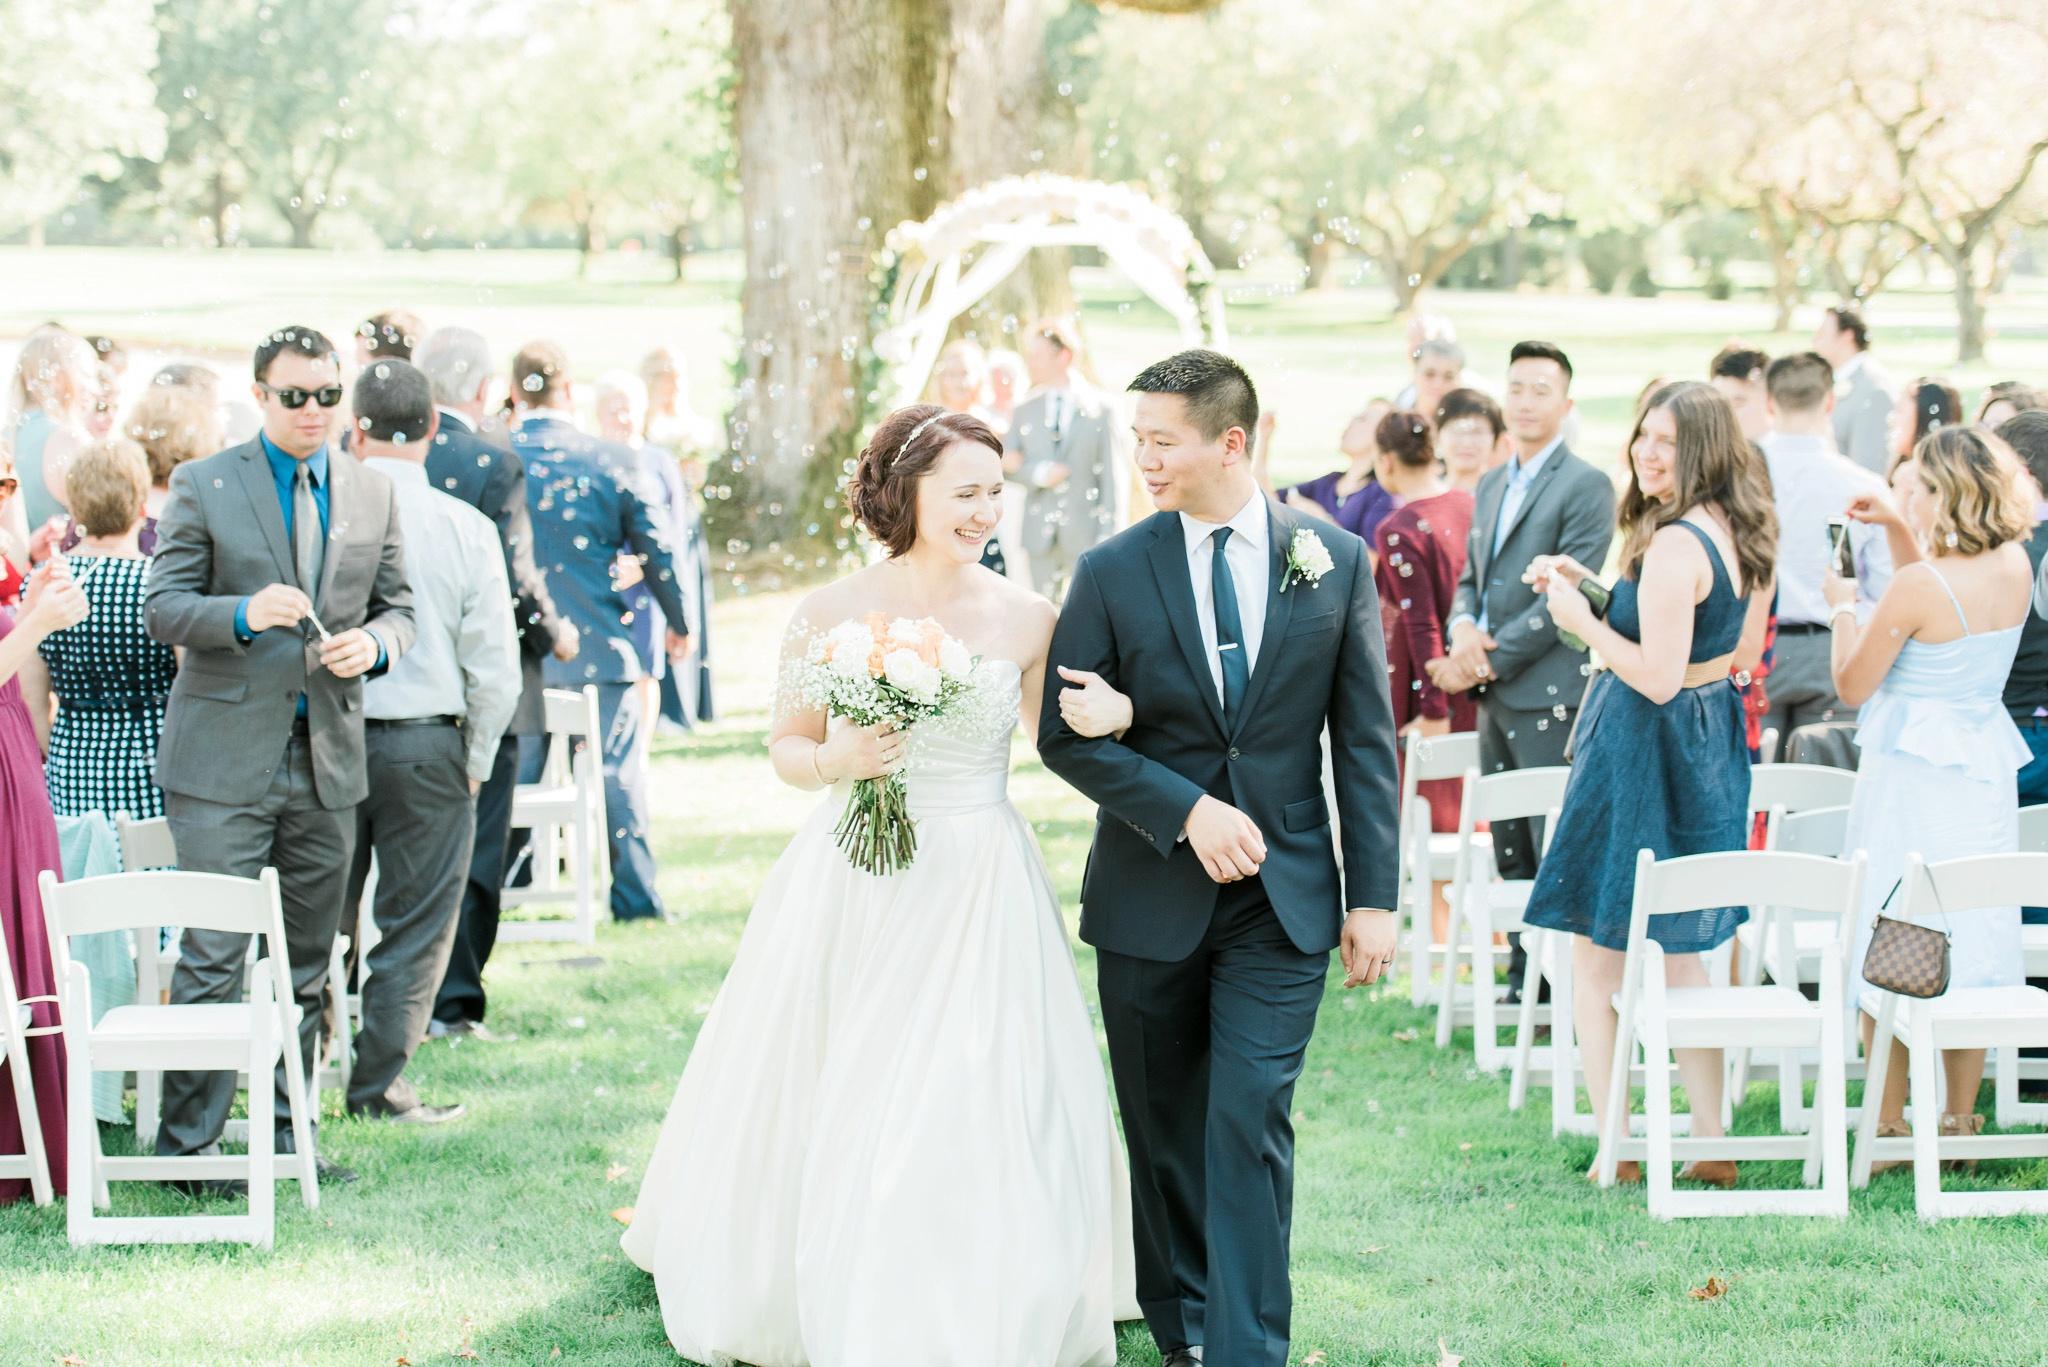 brookside-golf-country-club-wedding-columbus-ohio-72.jpg